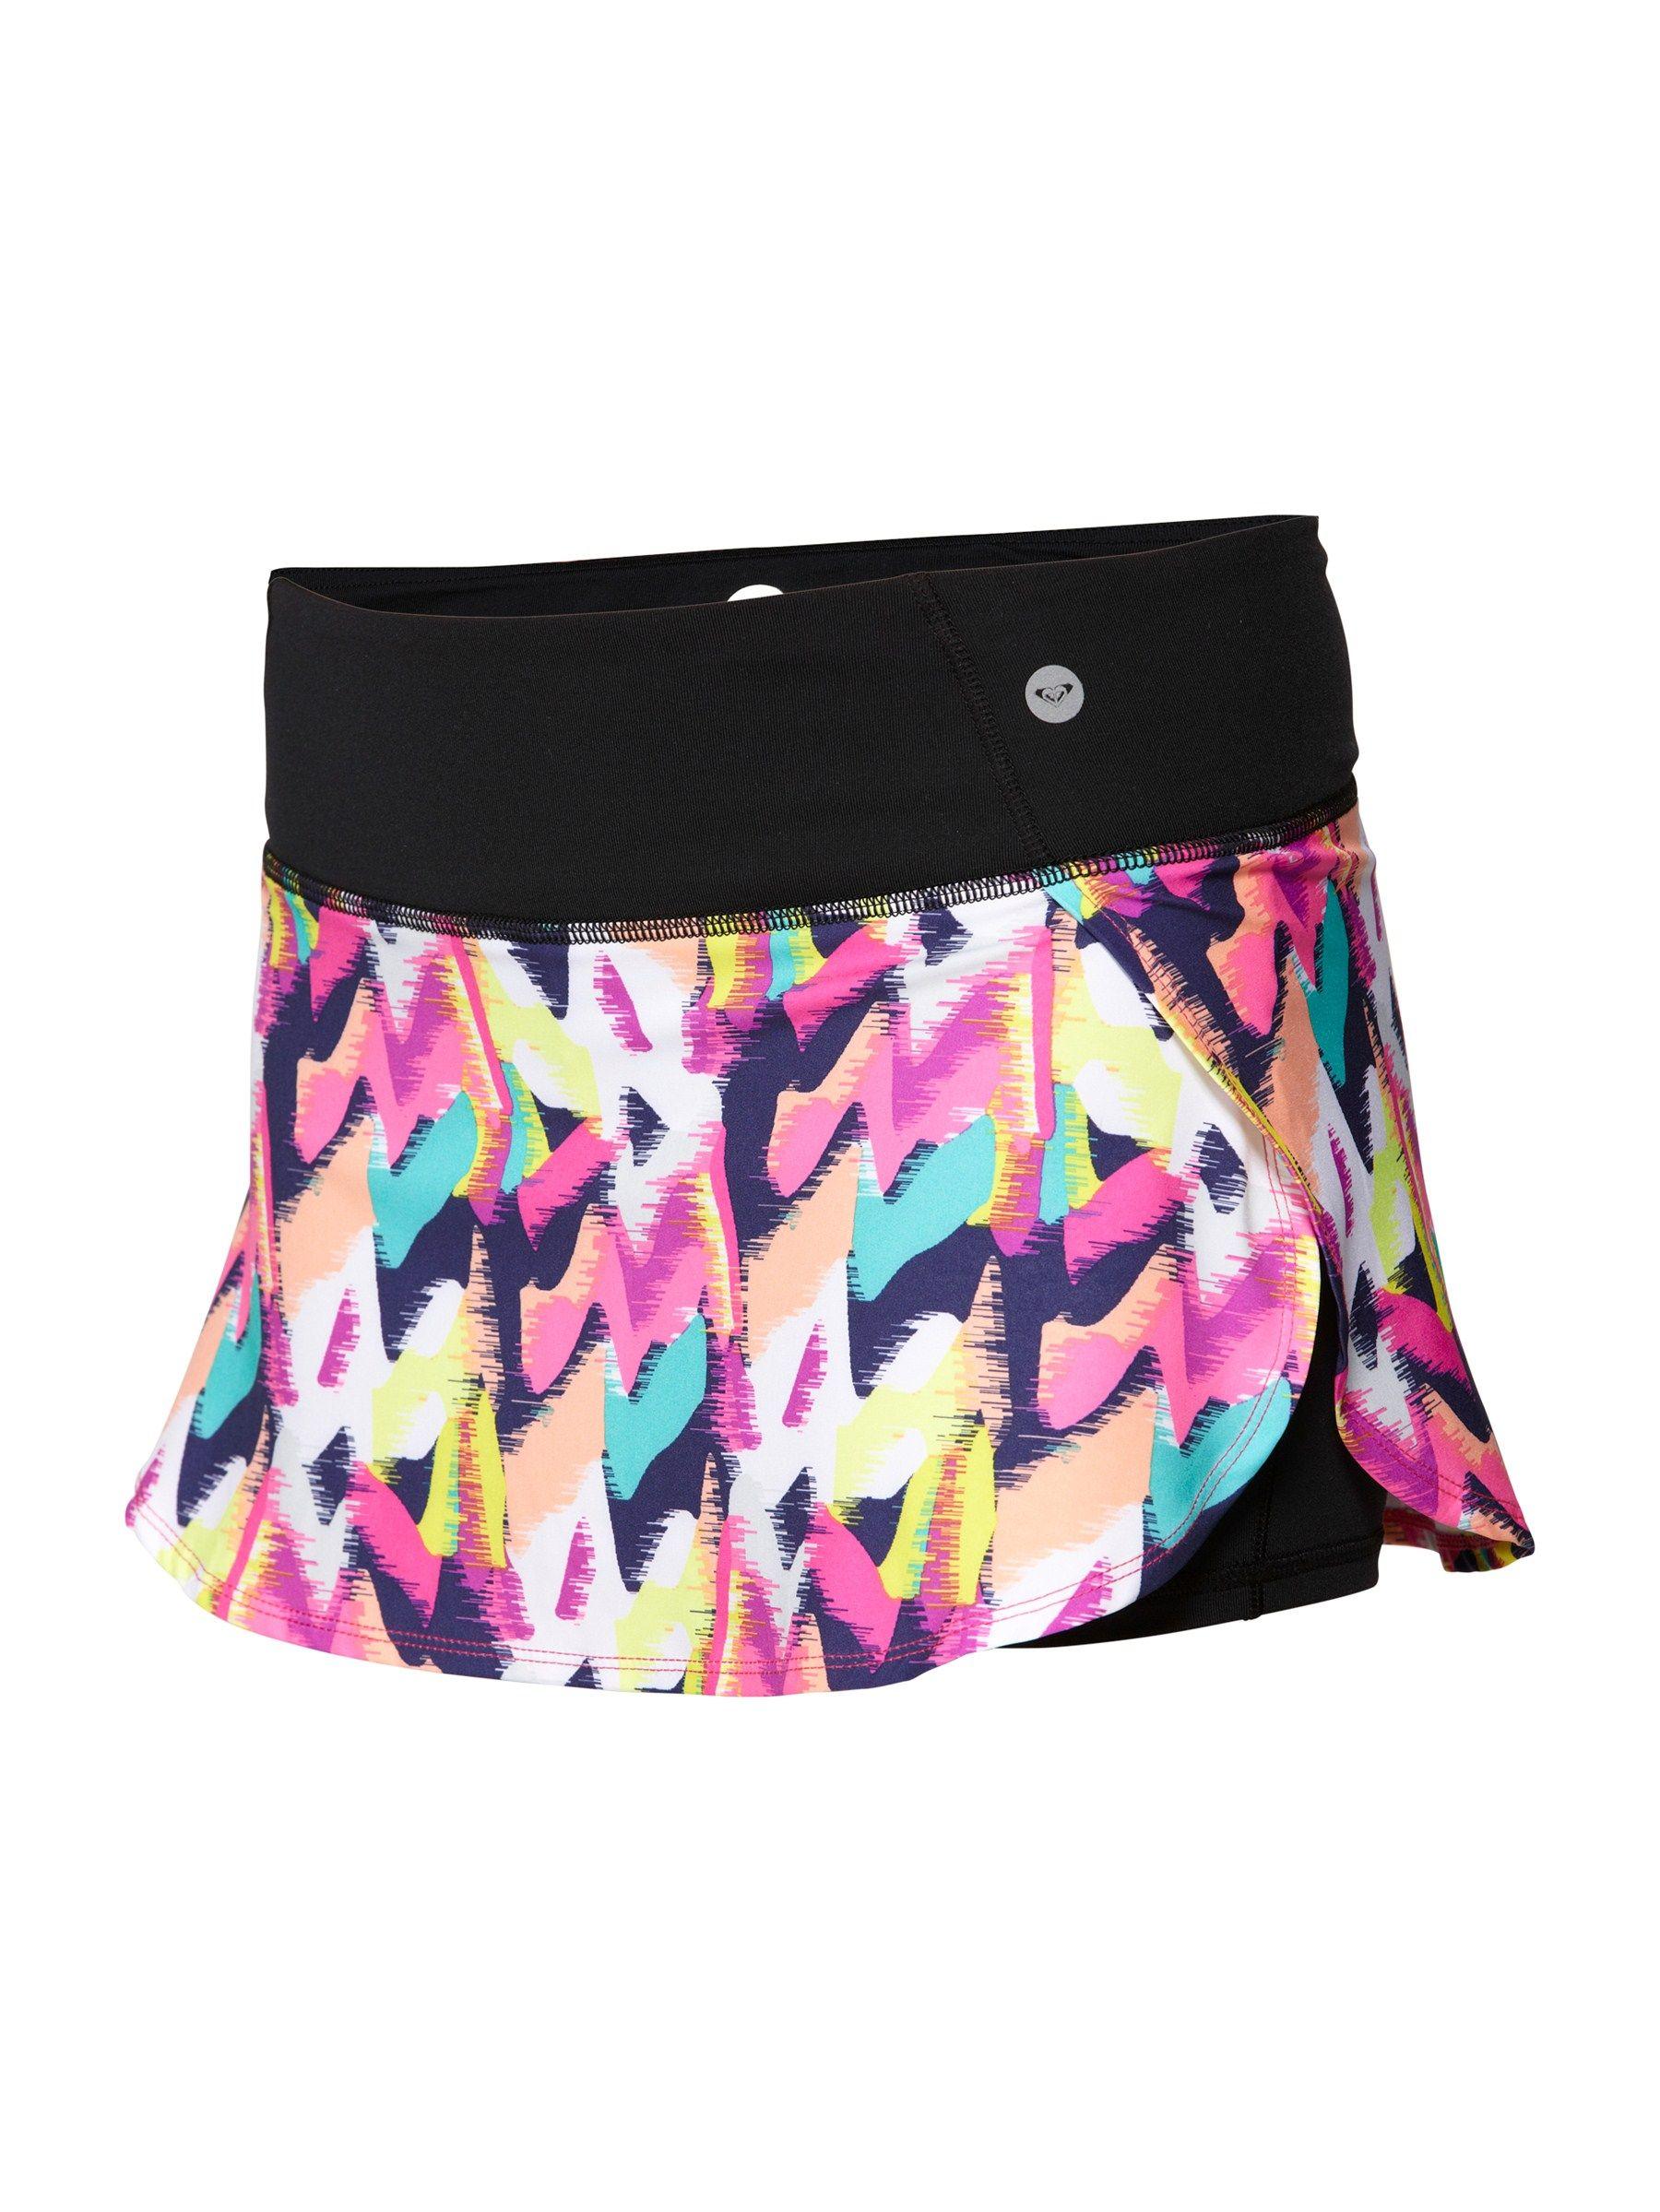 4e5f89d1805f5 Super cute running skirt by Roxy | Sports - Fitness | Running skirts ...